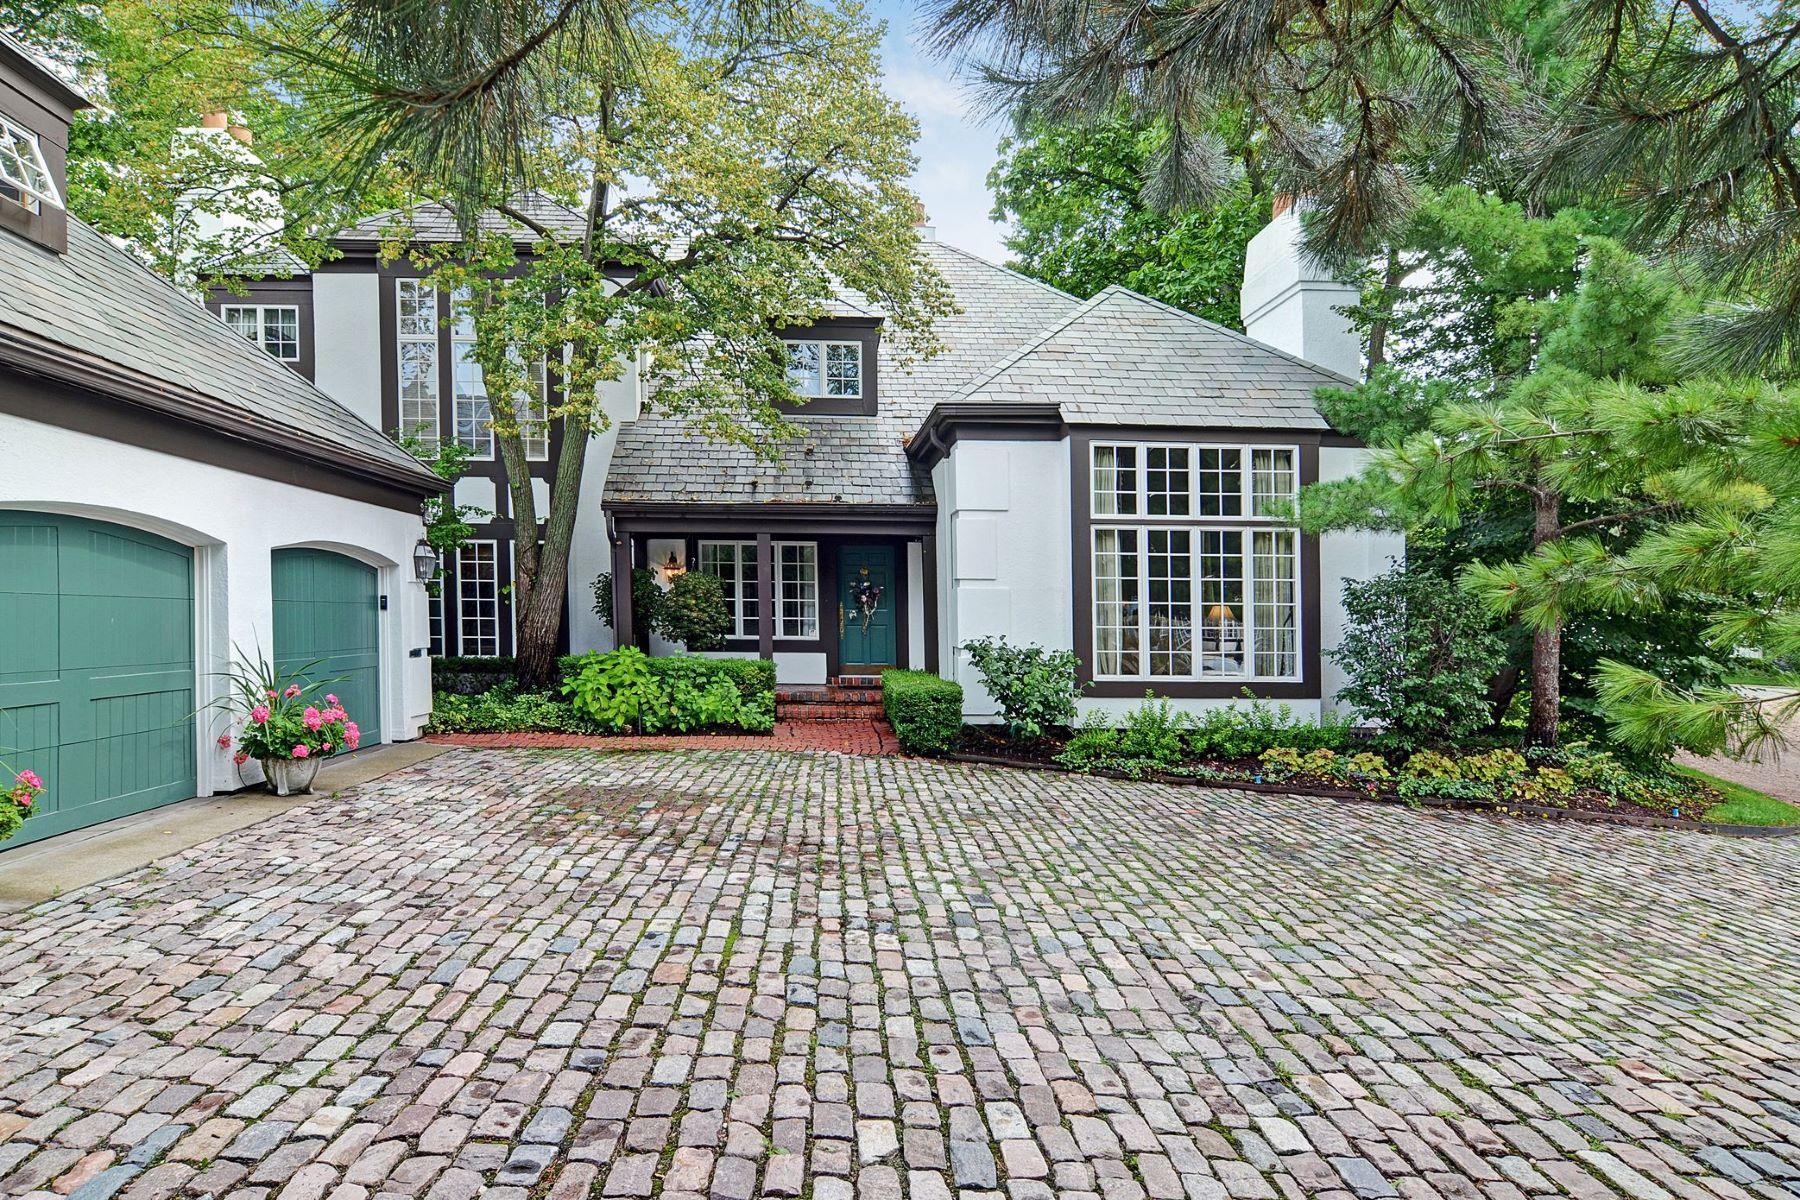 Property για την Πώληση στο 1503 Burr Ridge Club Drive, Burr Ridge, Ιλινοϊσ 60527 Ηνωμένες Πολιτείες